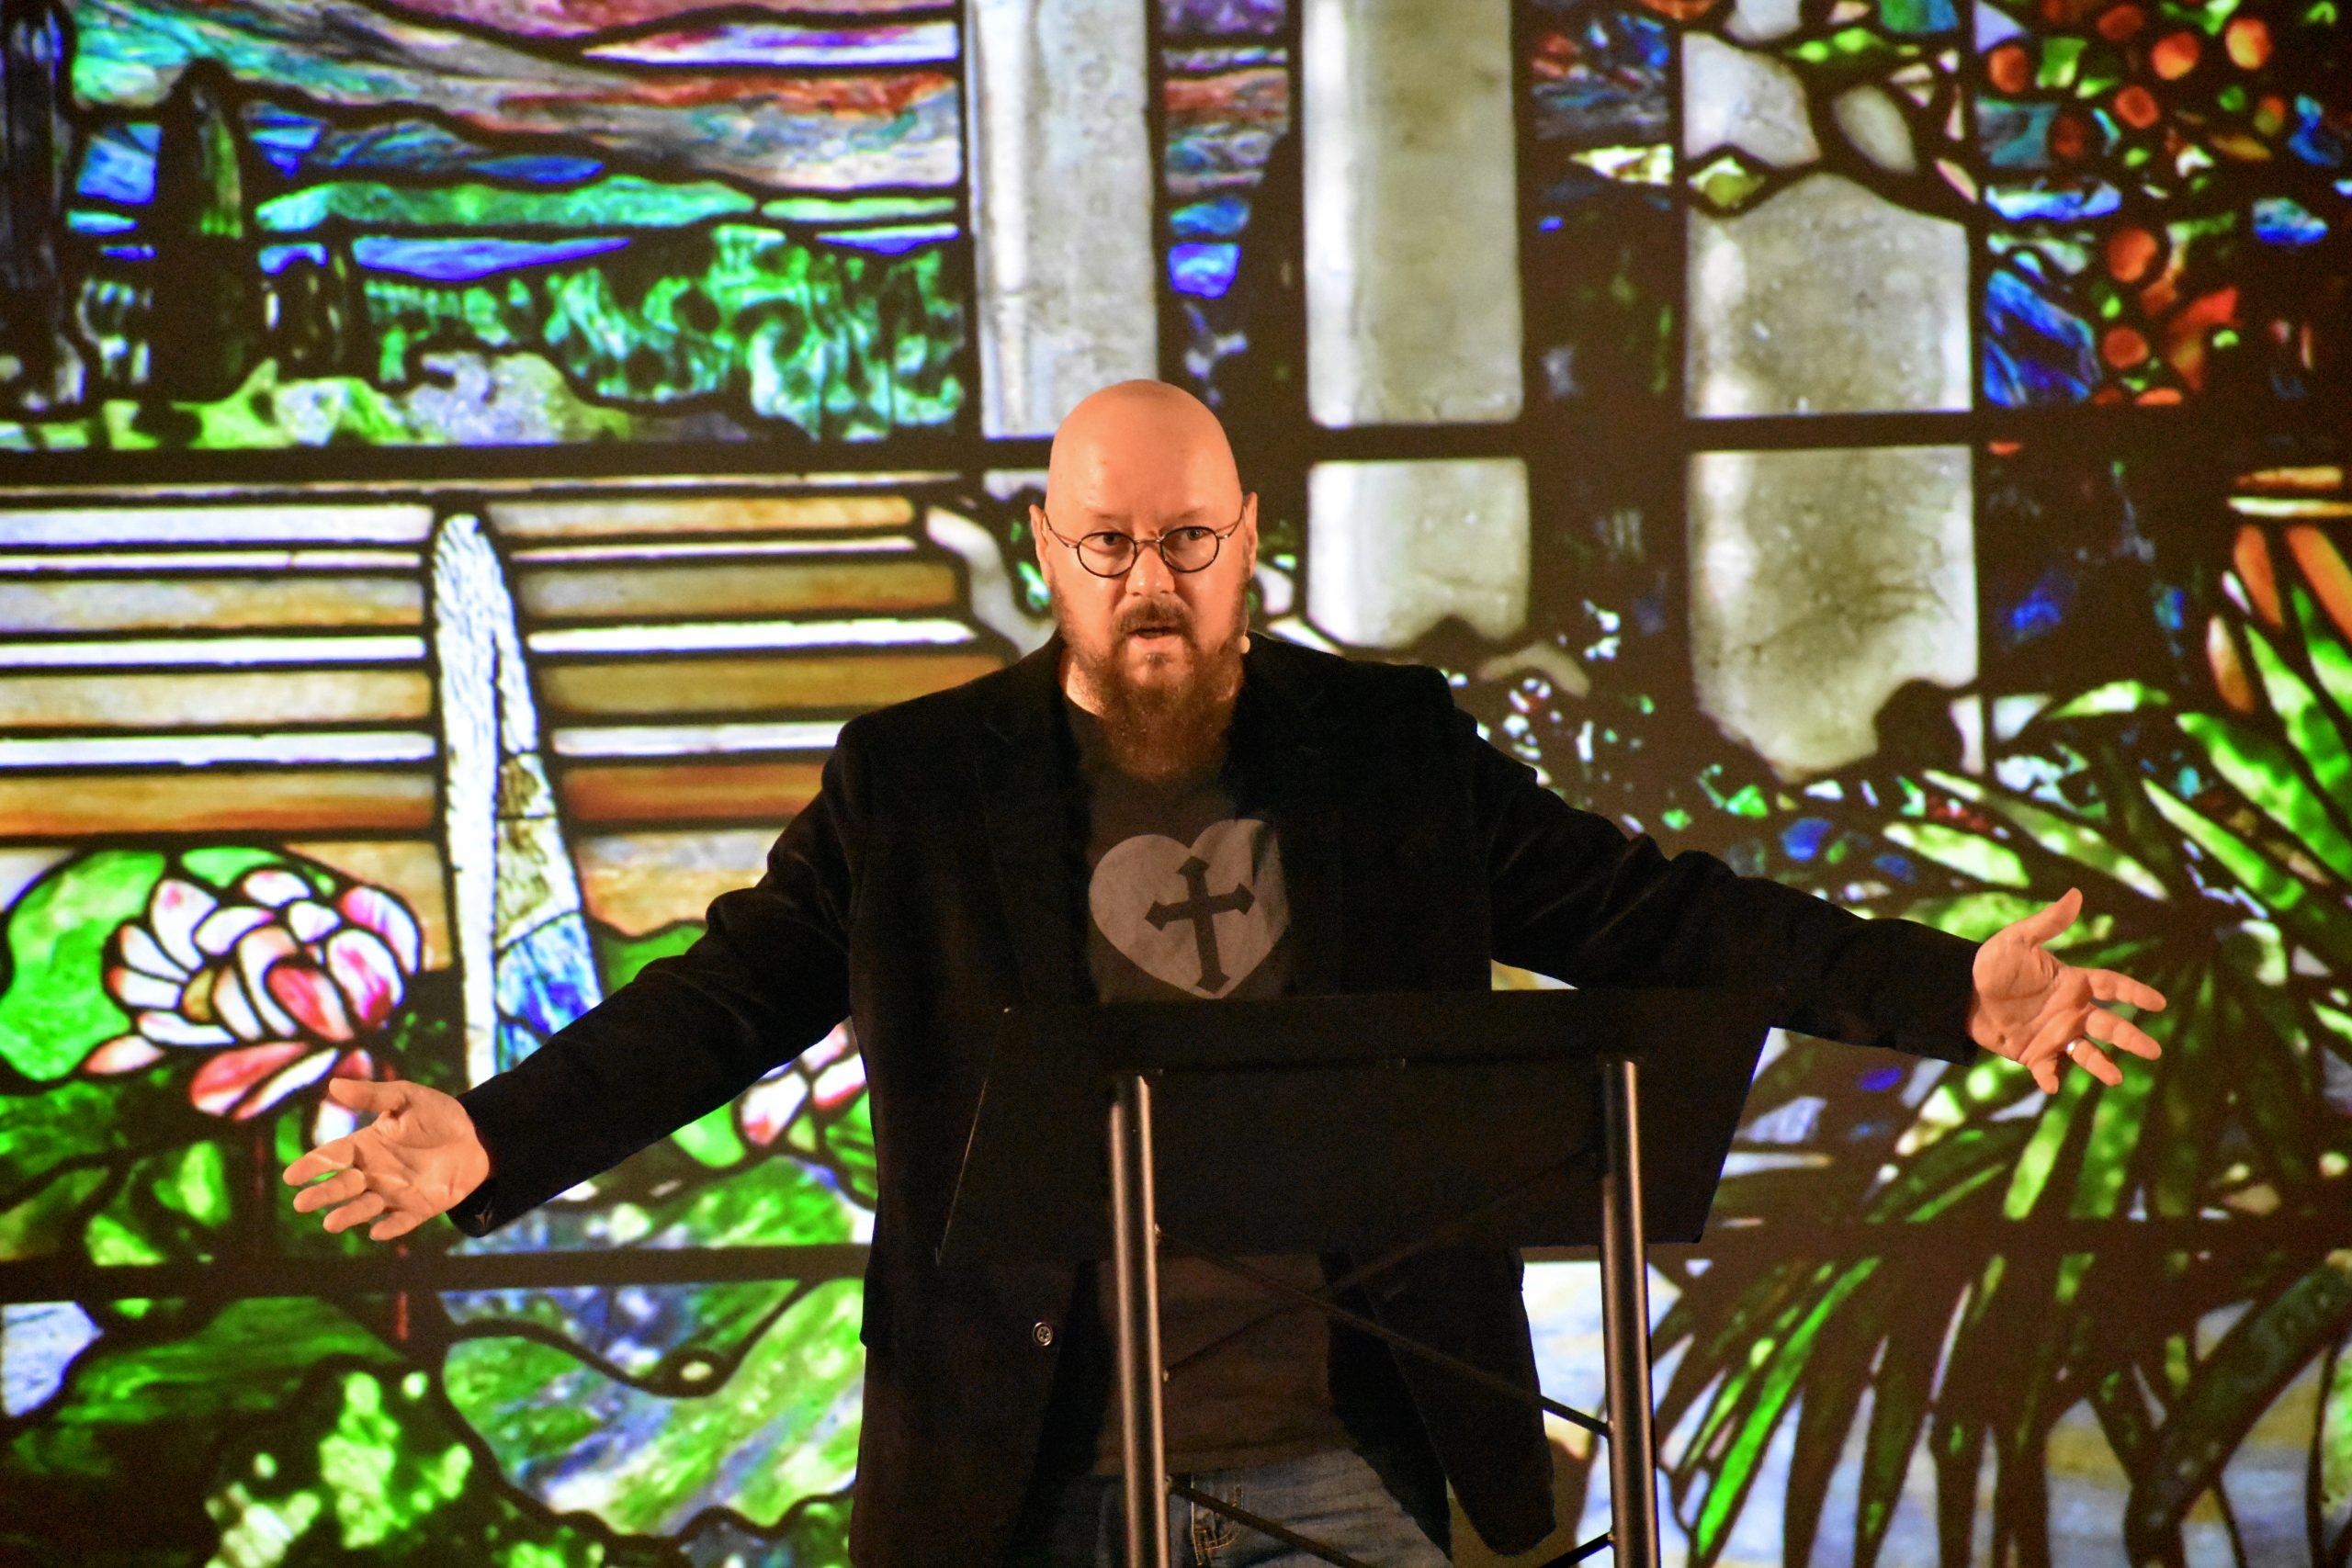 Frank Preaching 2020 Window